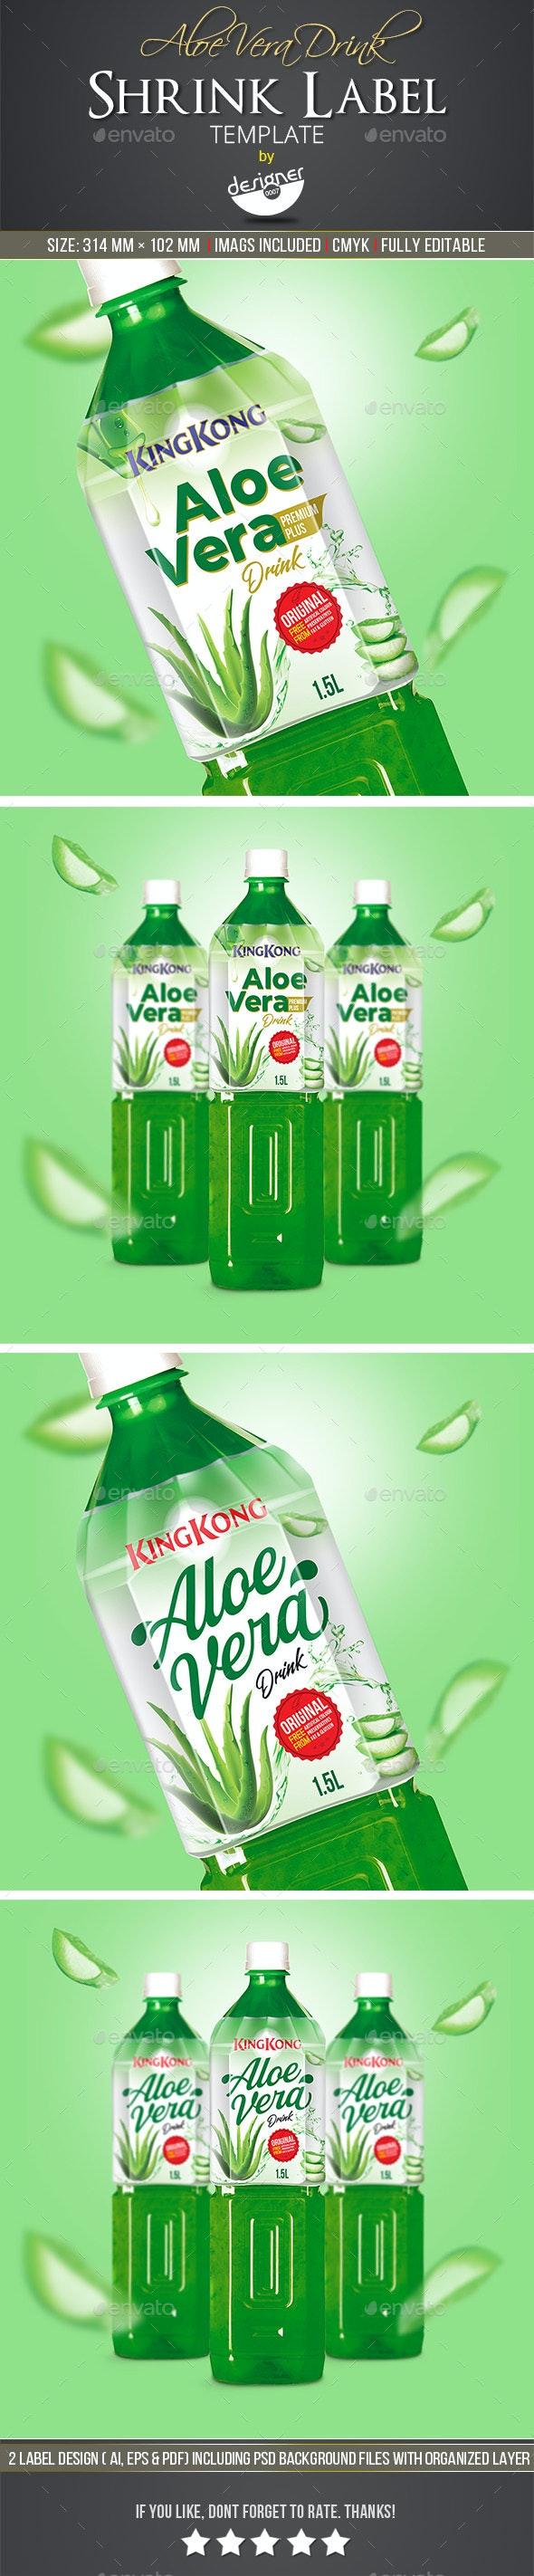 Aloe Vera Drink Label Template - Packaging Print Templates